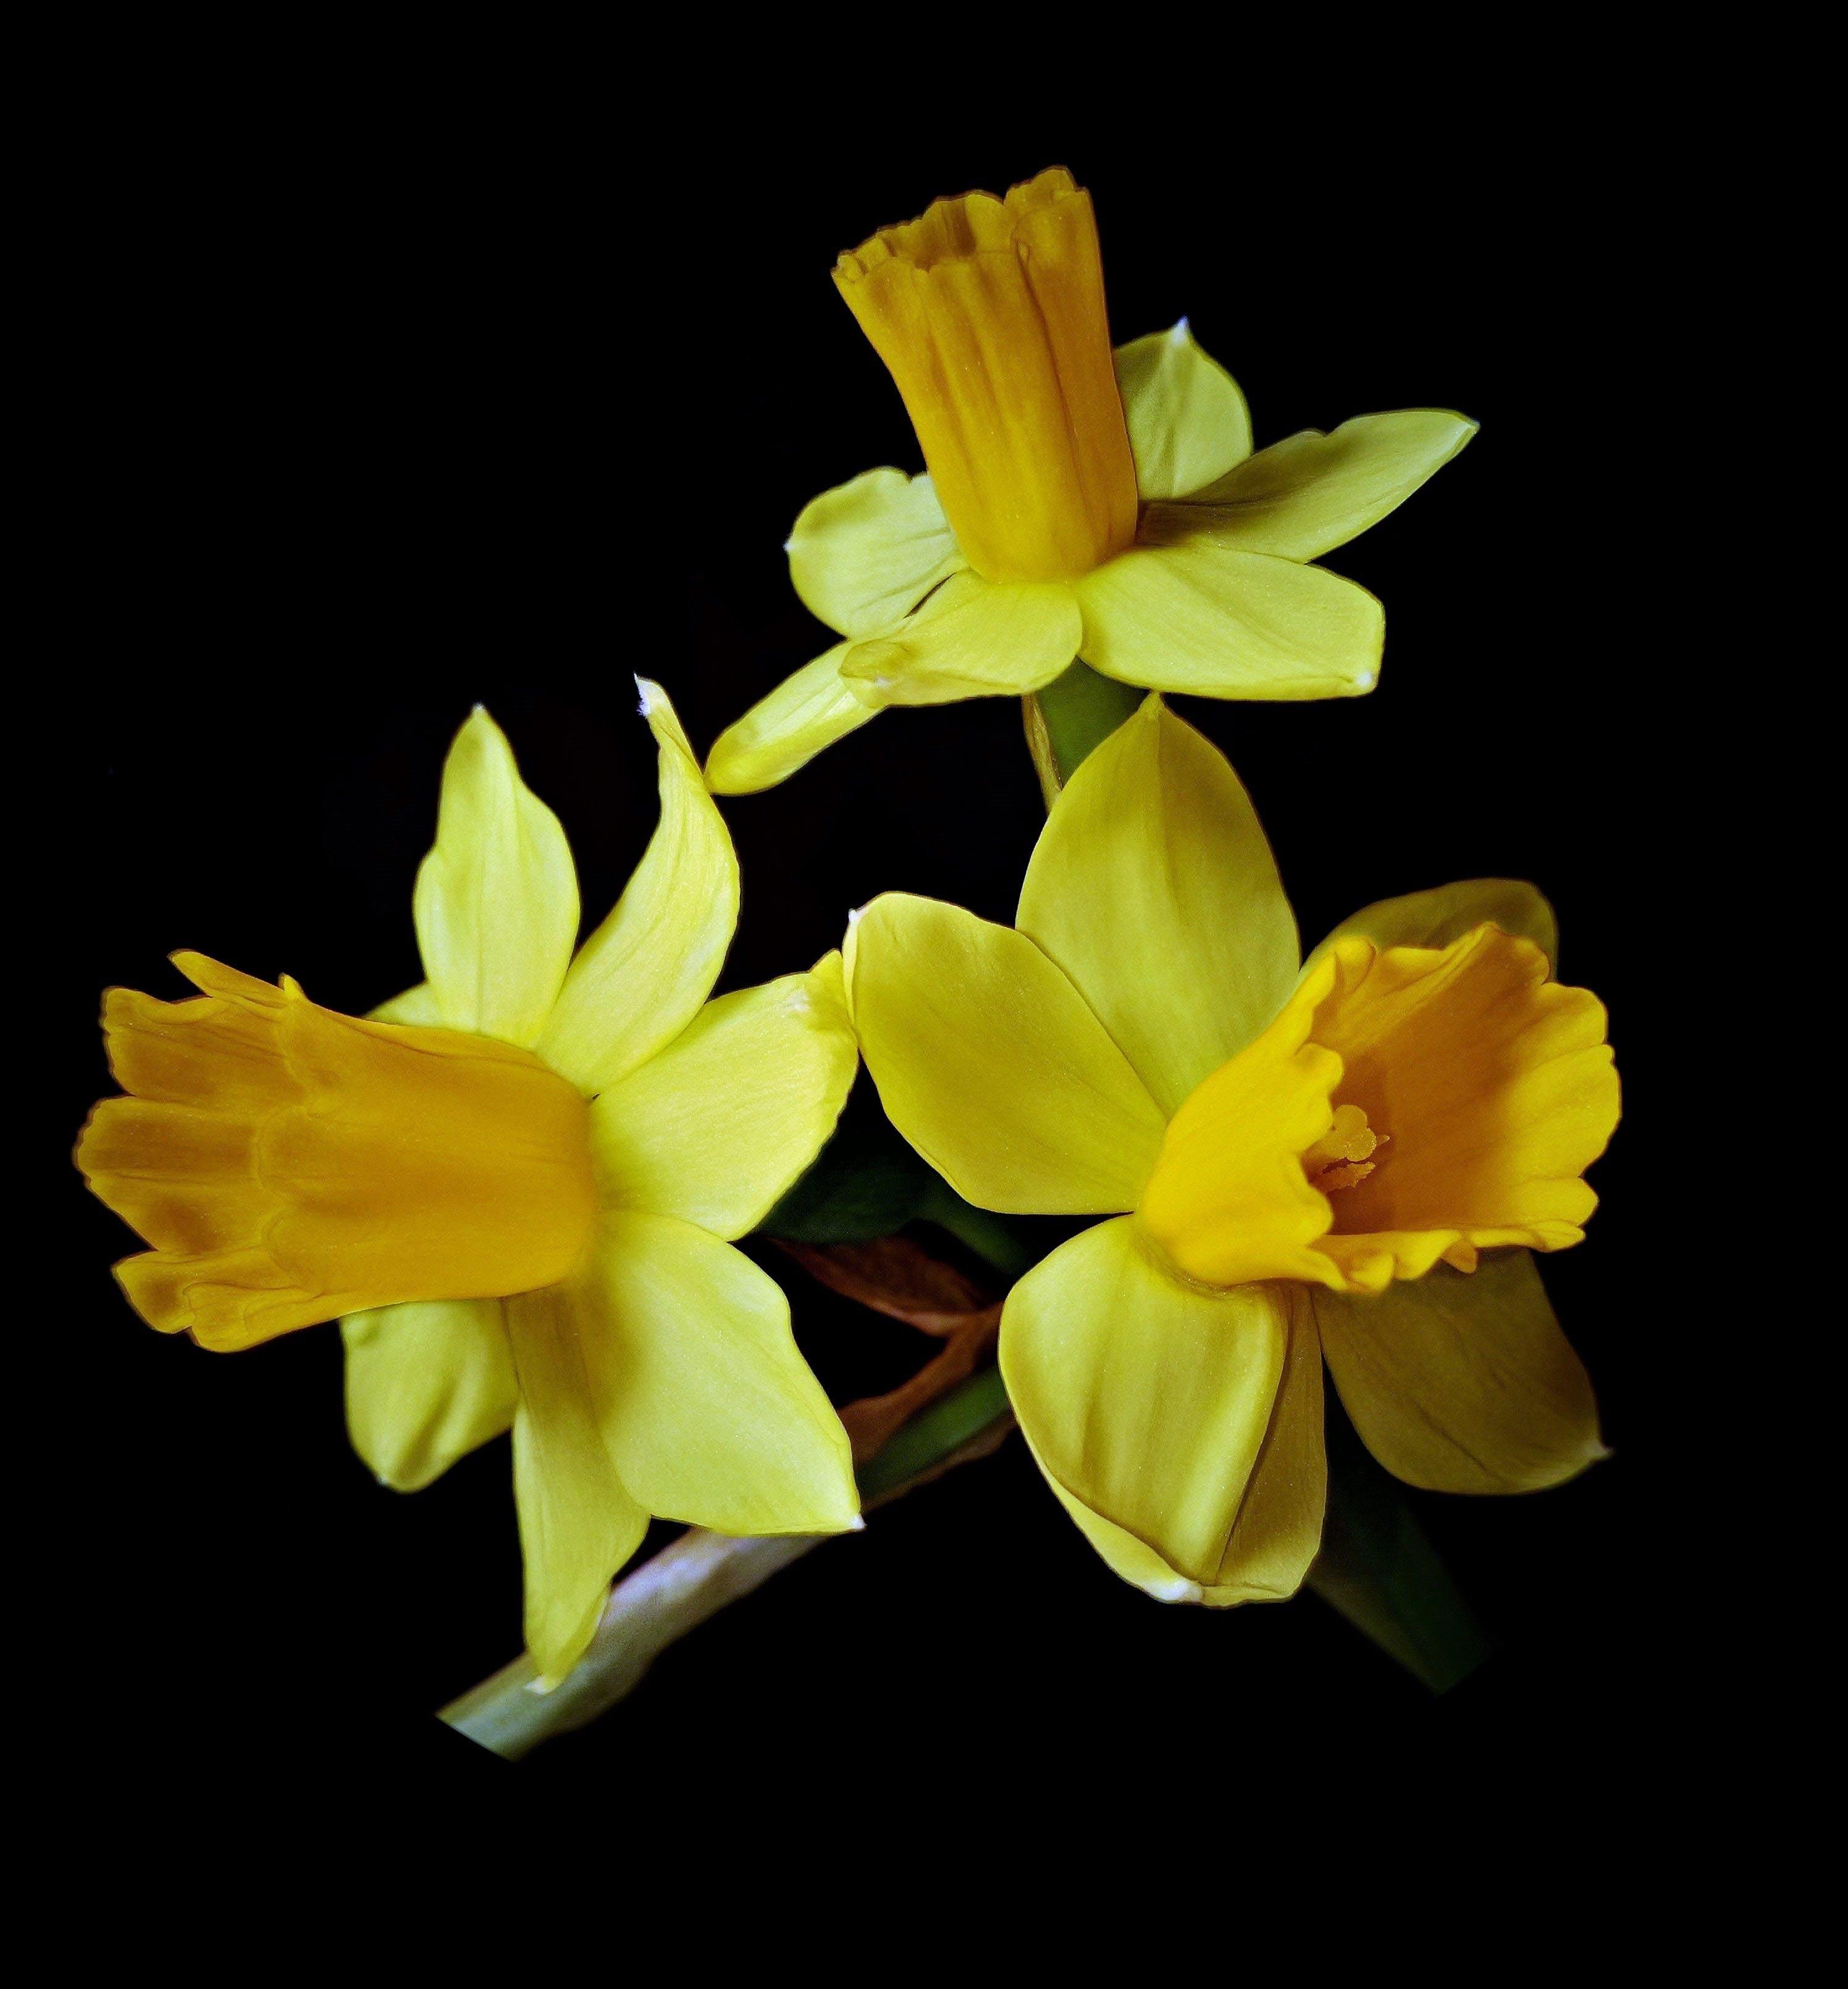 Free stock photo of close, daffodils, dark background, inside darker bell flowers